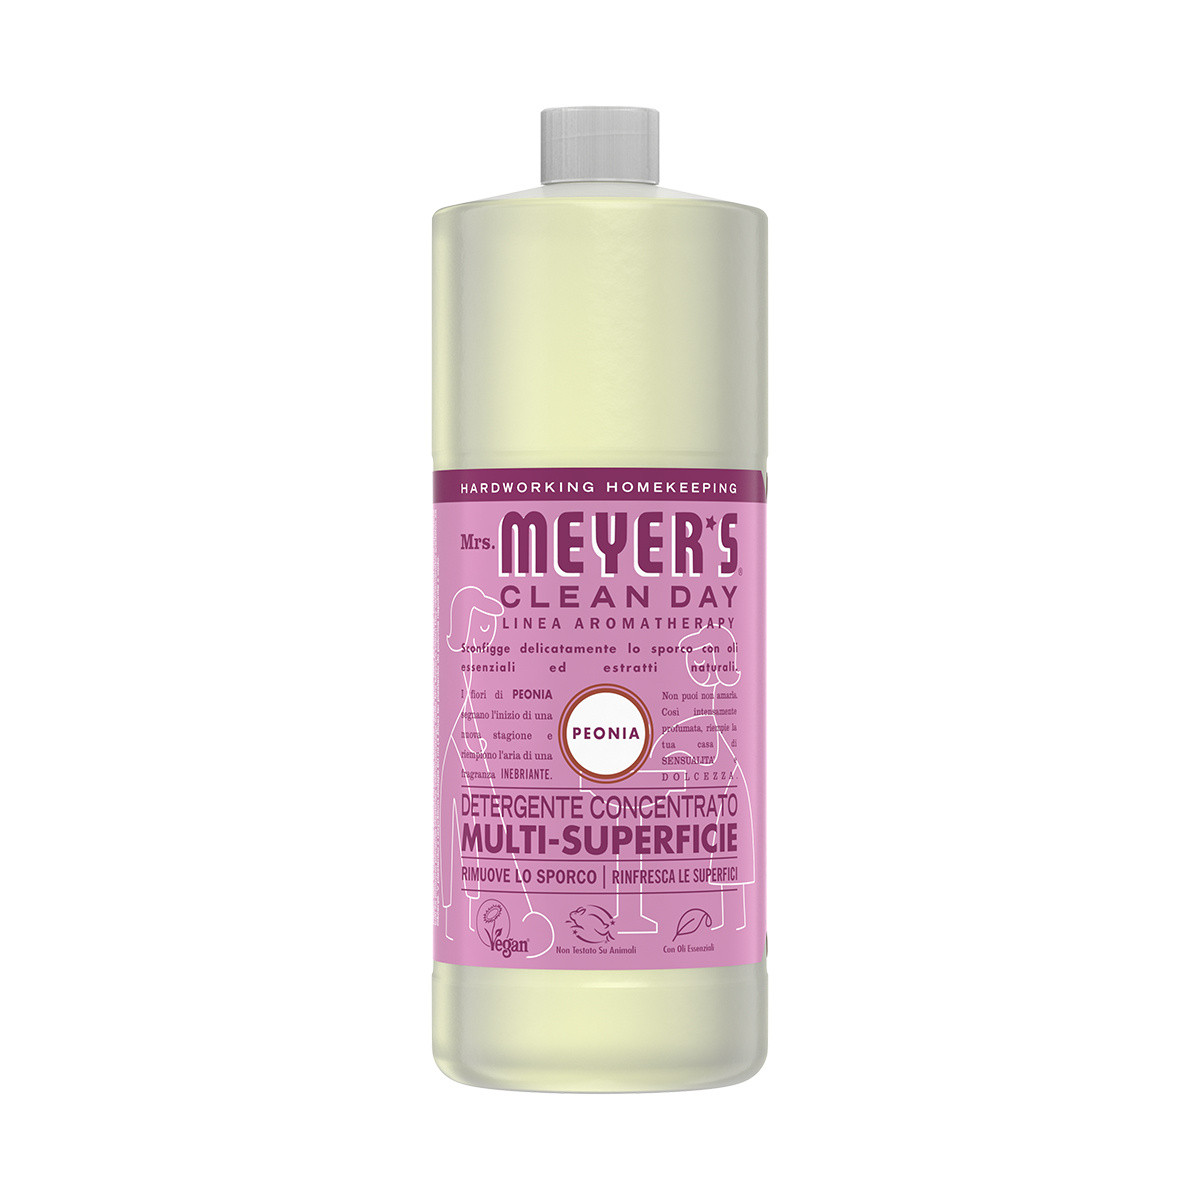 Detergente concentrato multi-supericie profumo di peonia 946ml, Rosa, large image number 0